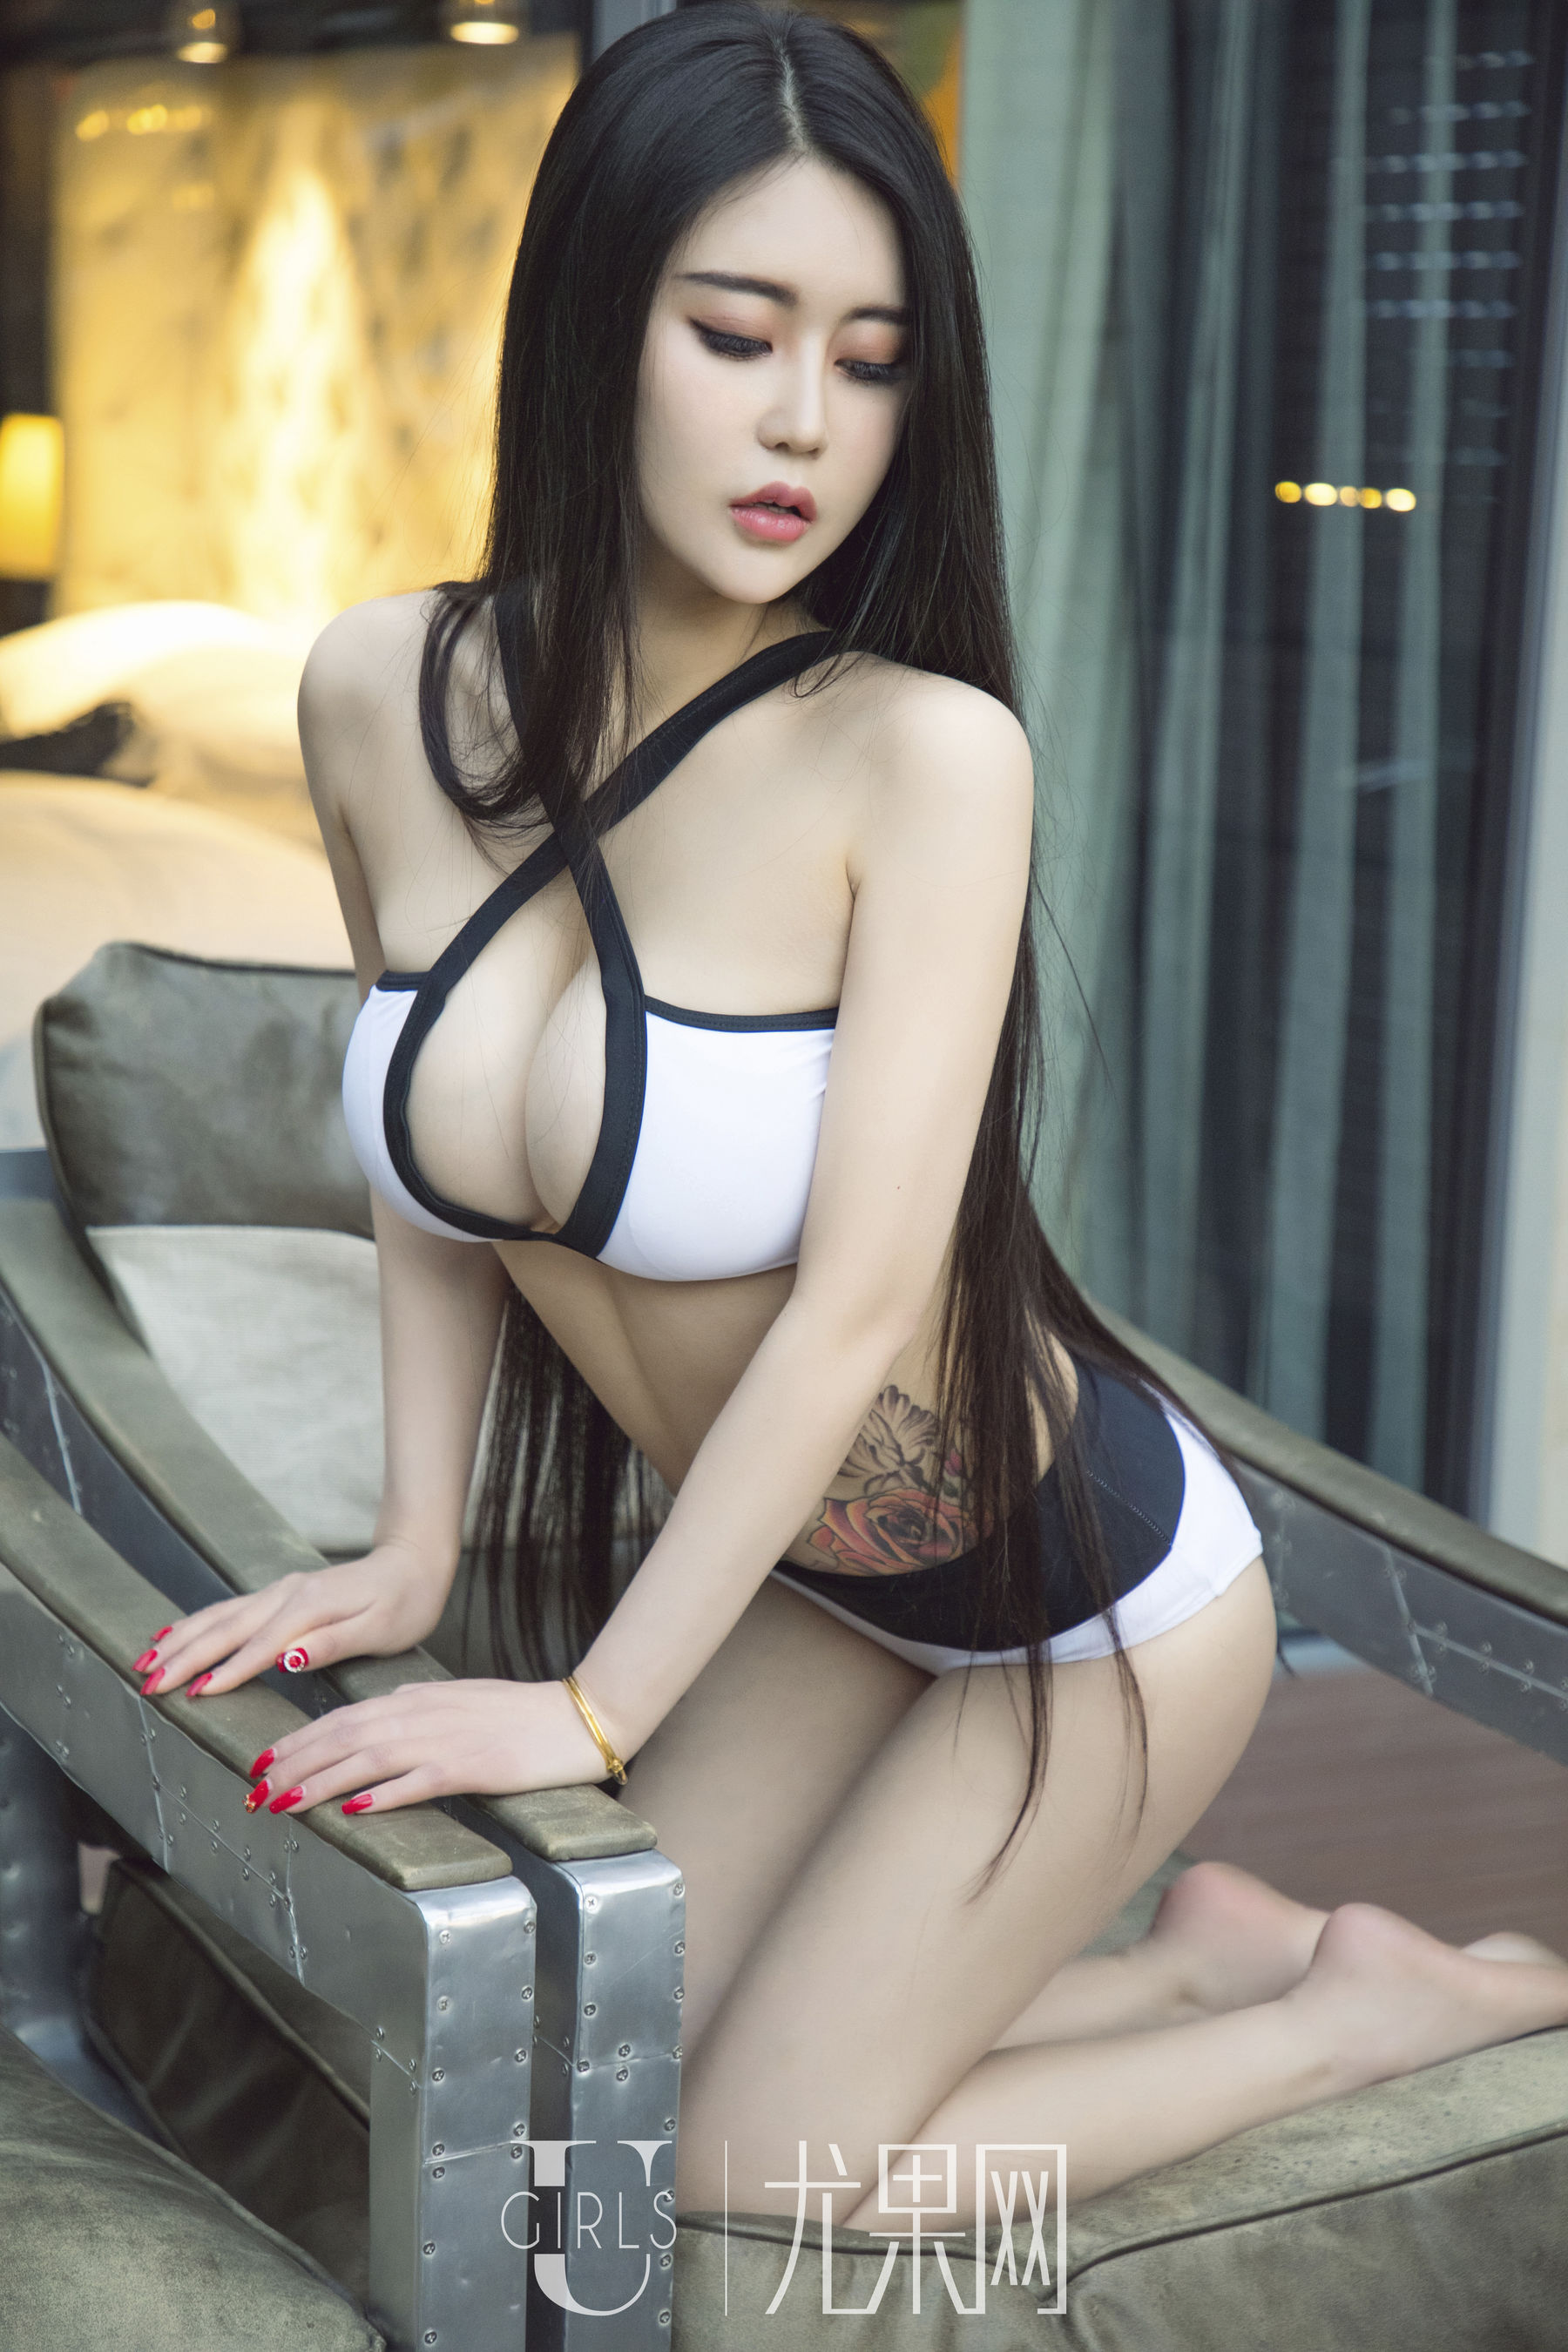 VOL.1274 [尤果网]美胸极品女神长发美女:小沫(尤果网小沫)超高清写真套图(65P)